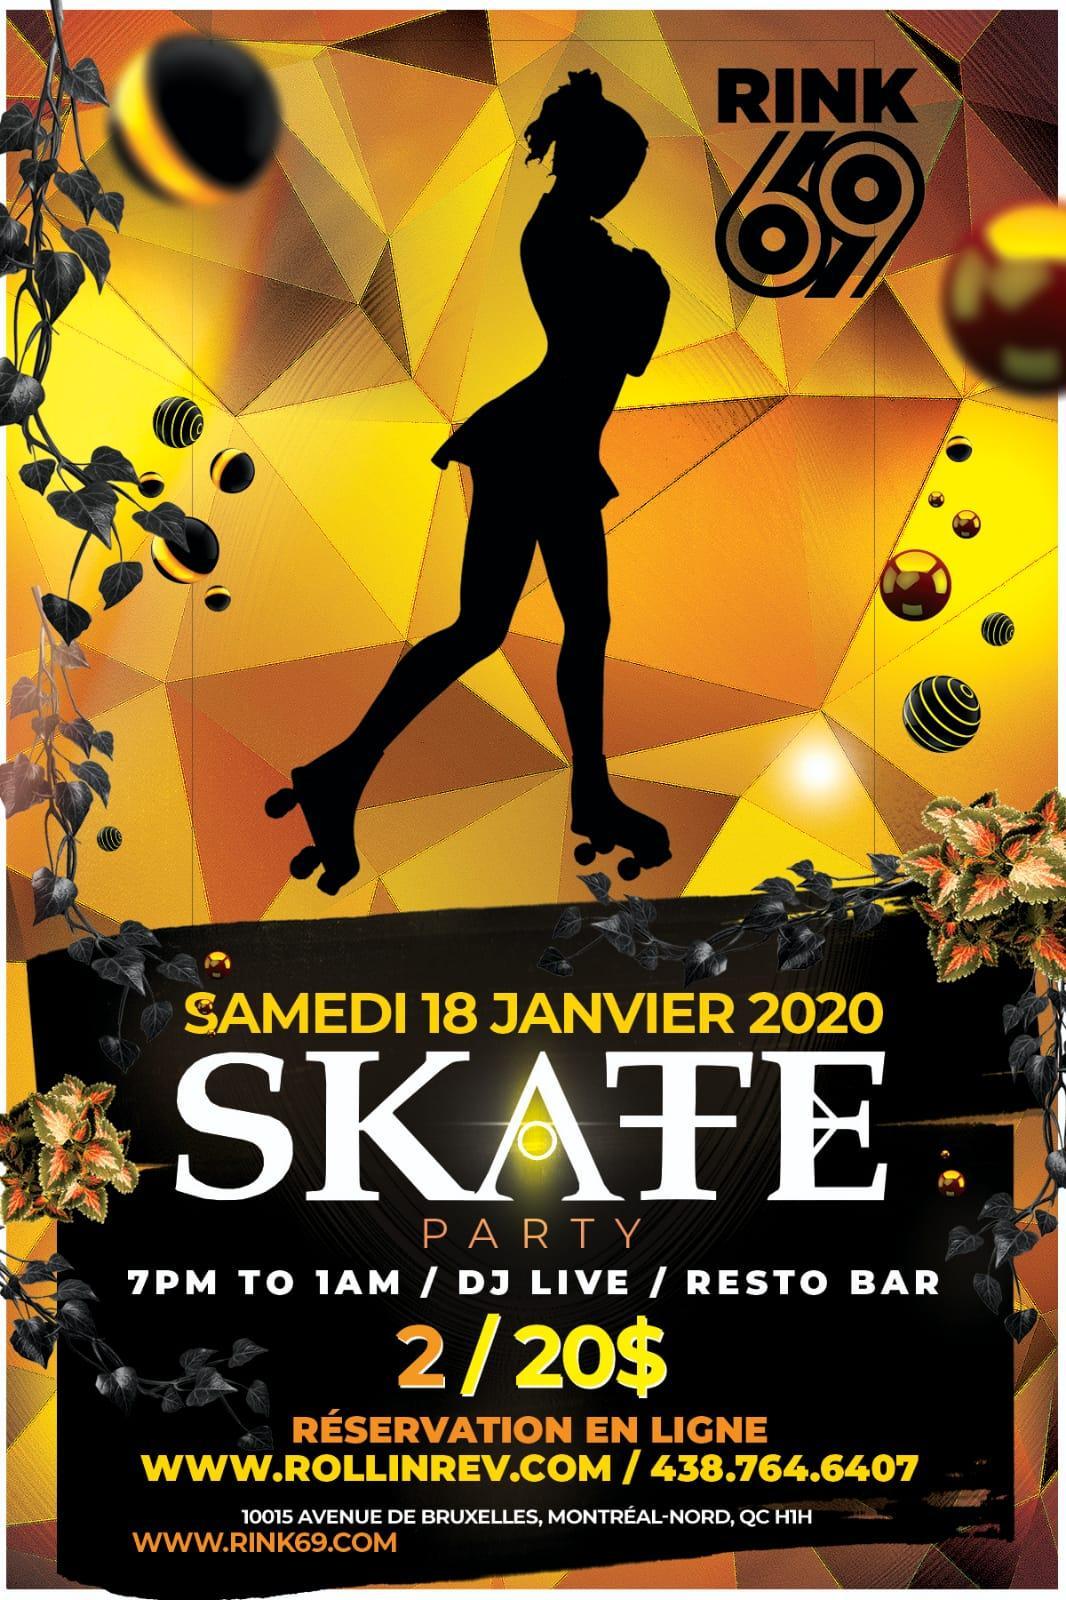 Complexe 98 Monreal - Roller Skate Party